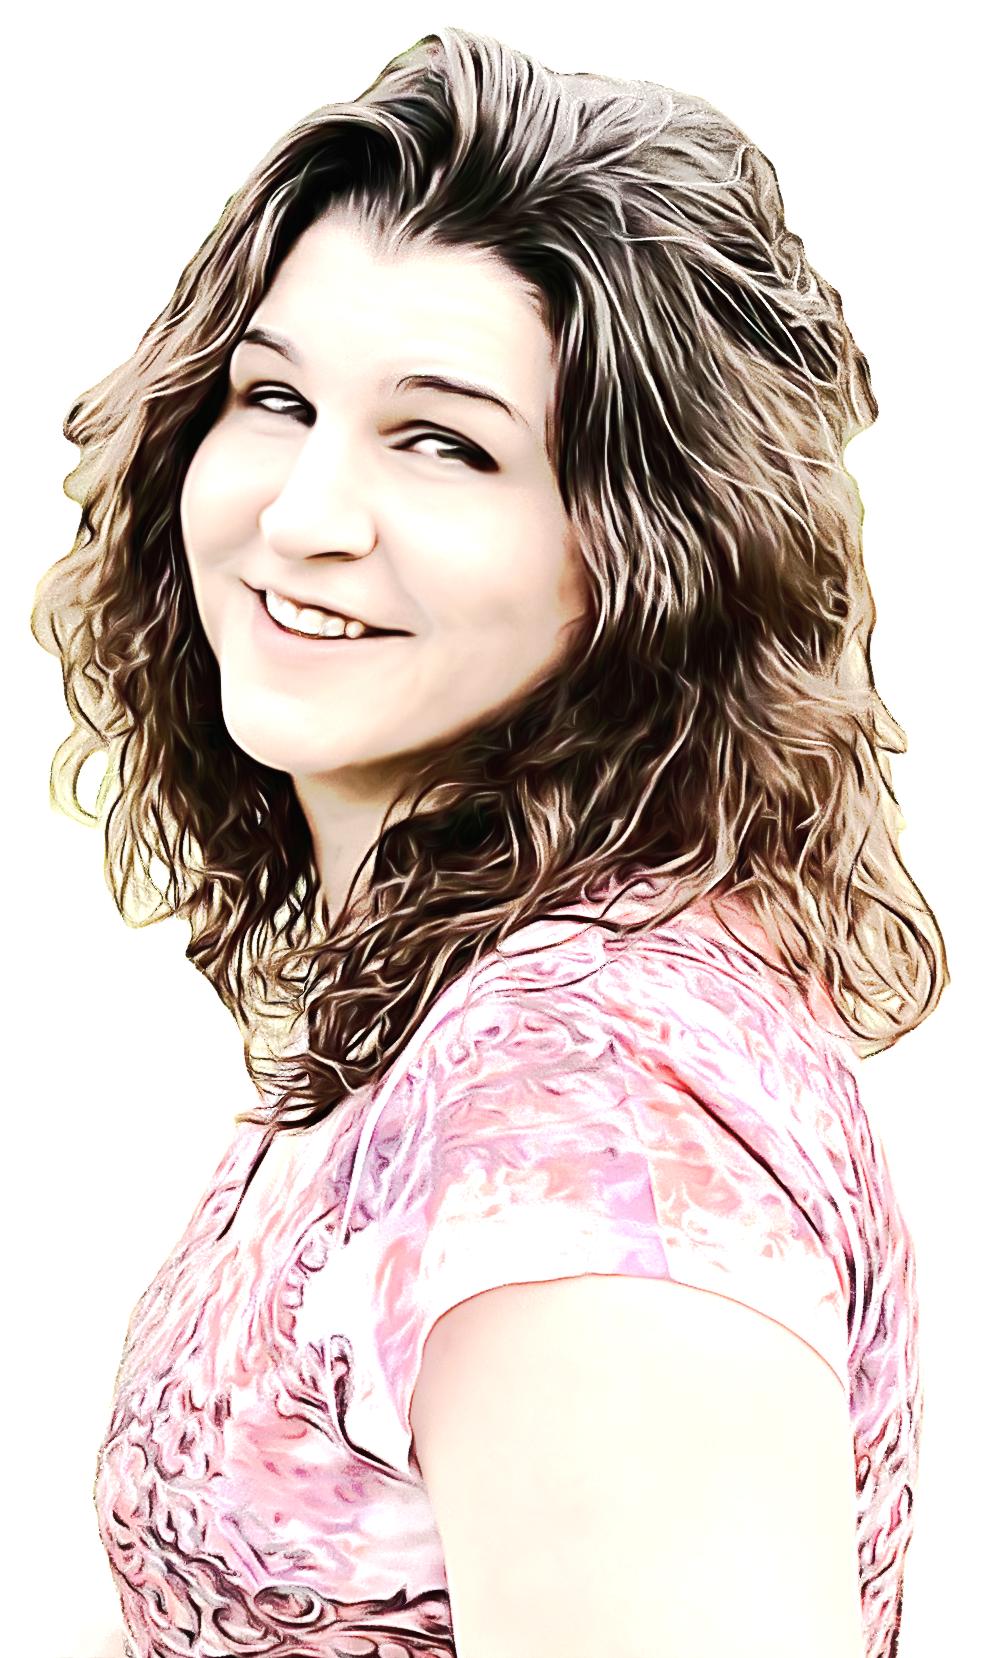 Heather Morales